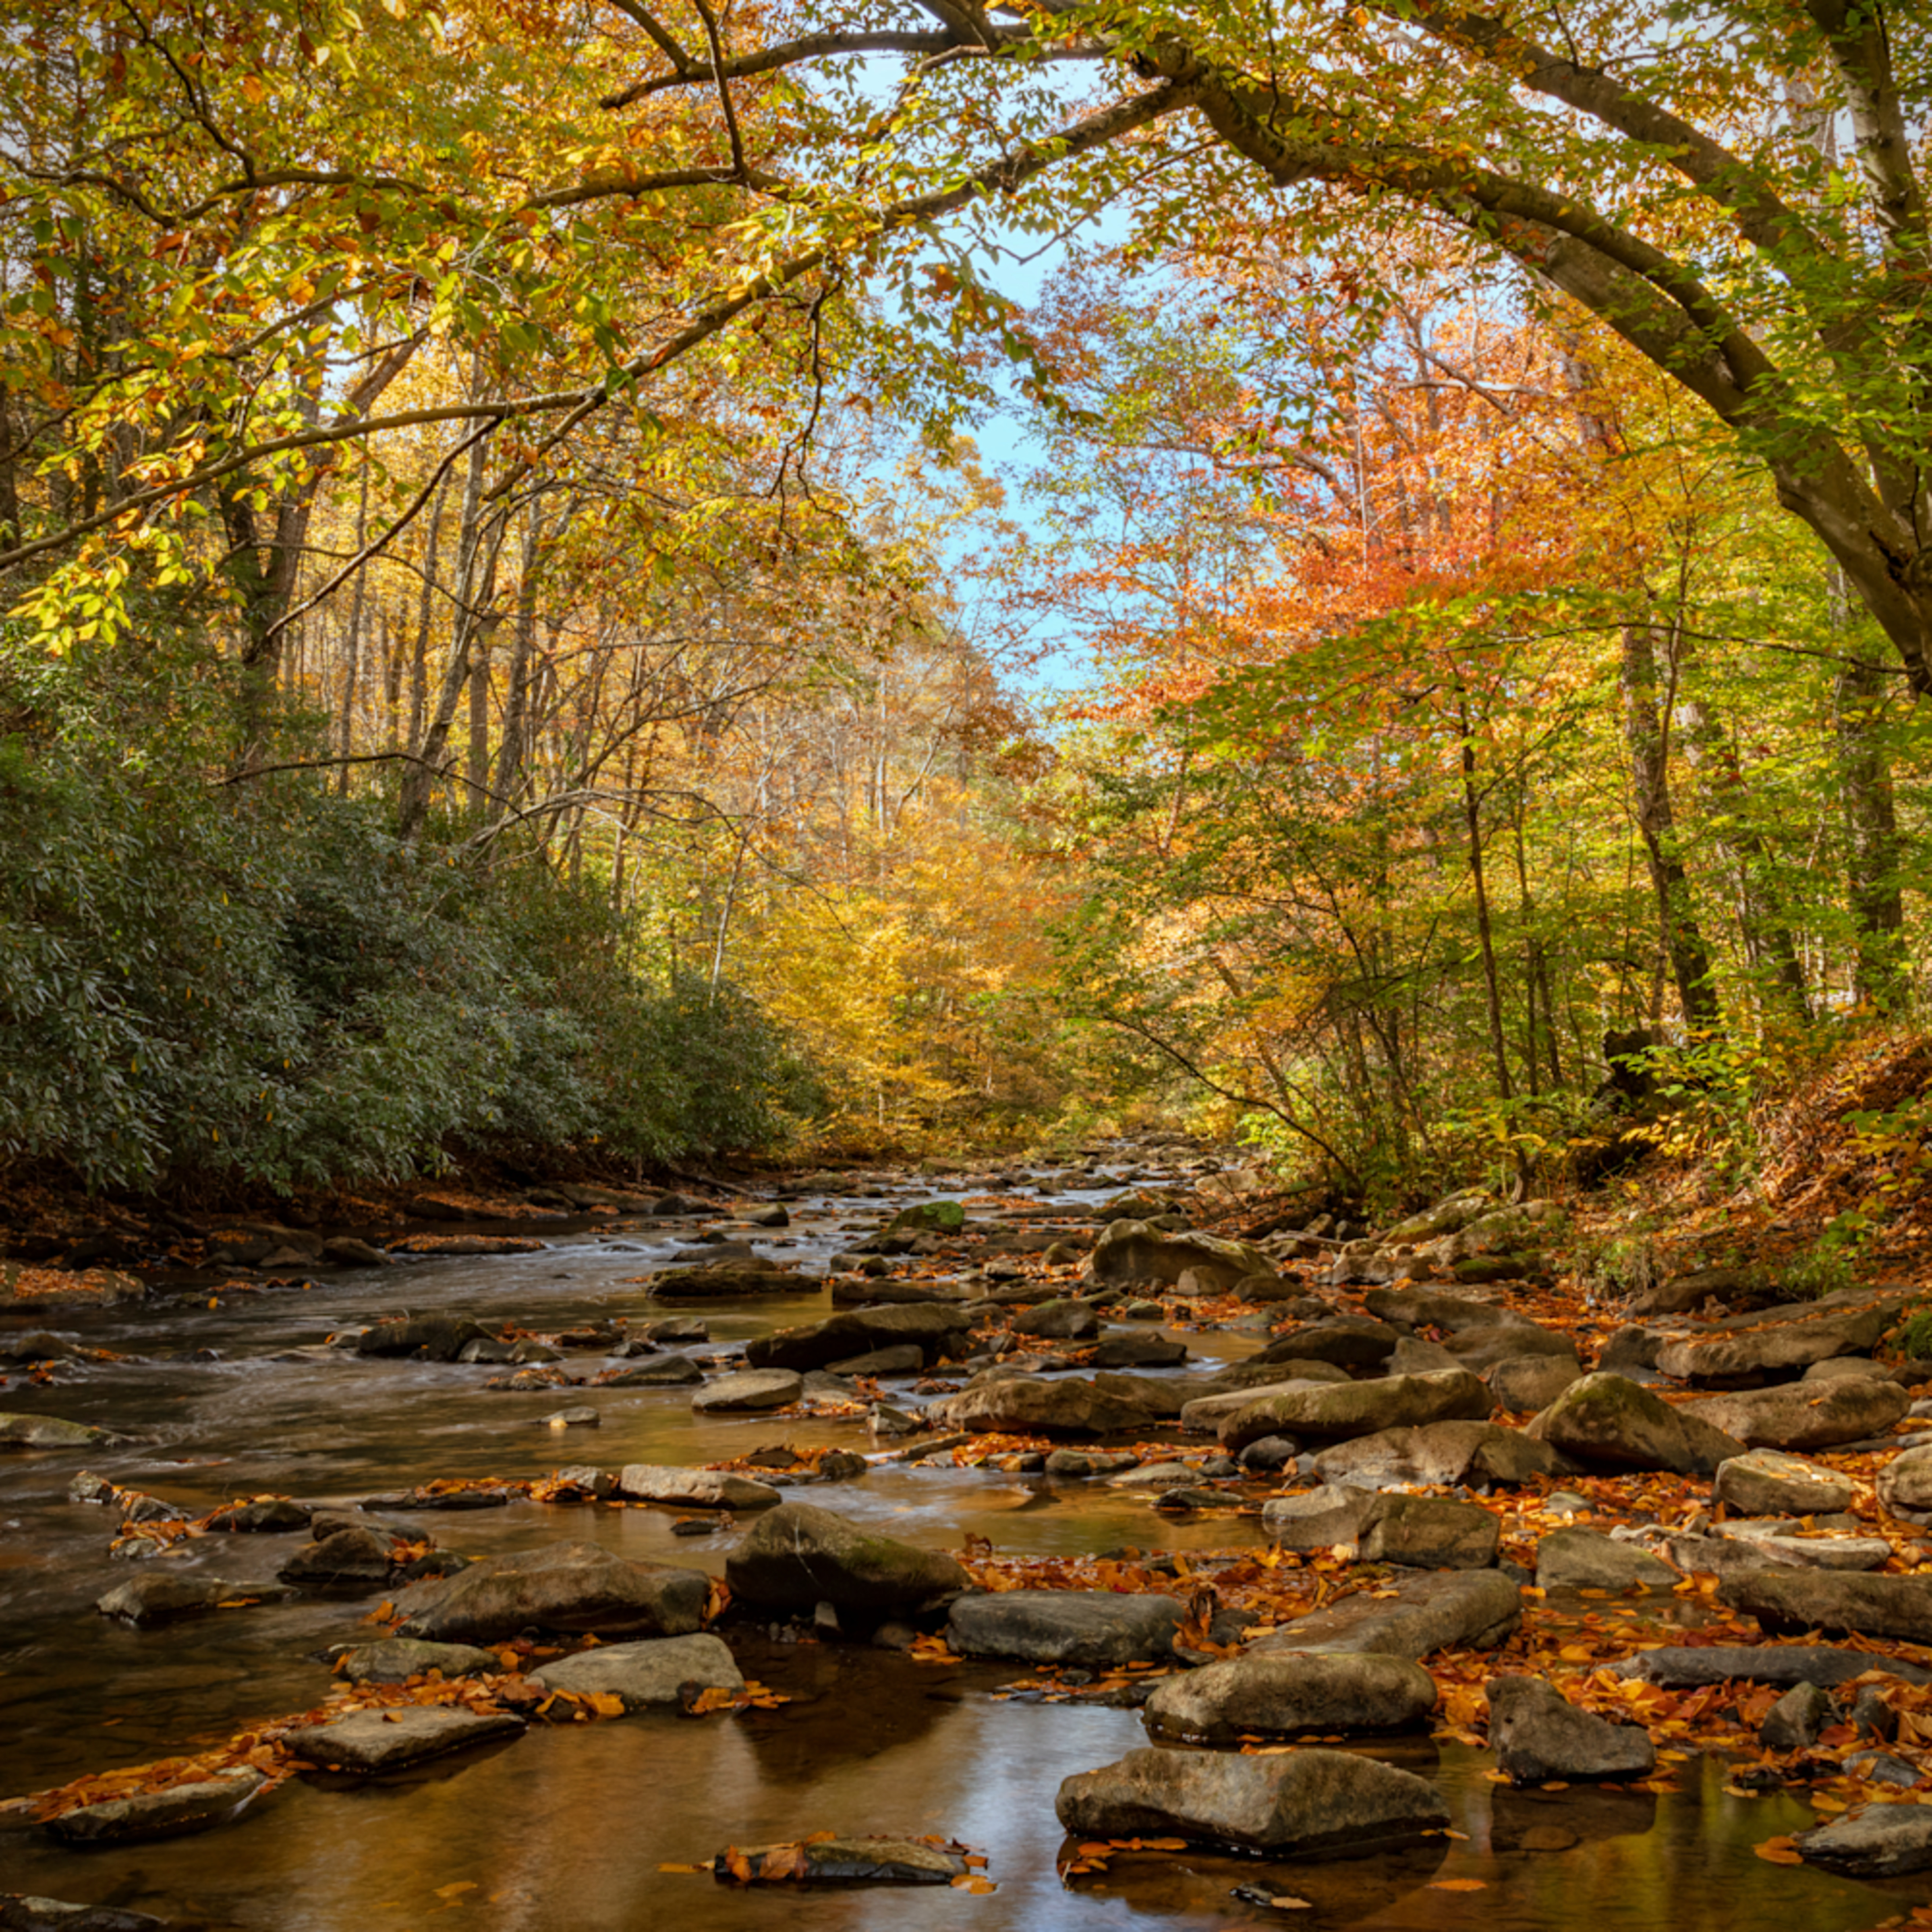 Fall dunlop creek west virginia 1547 fss j2uwow